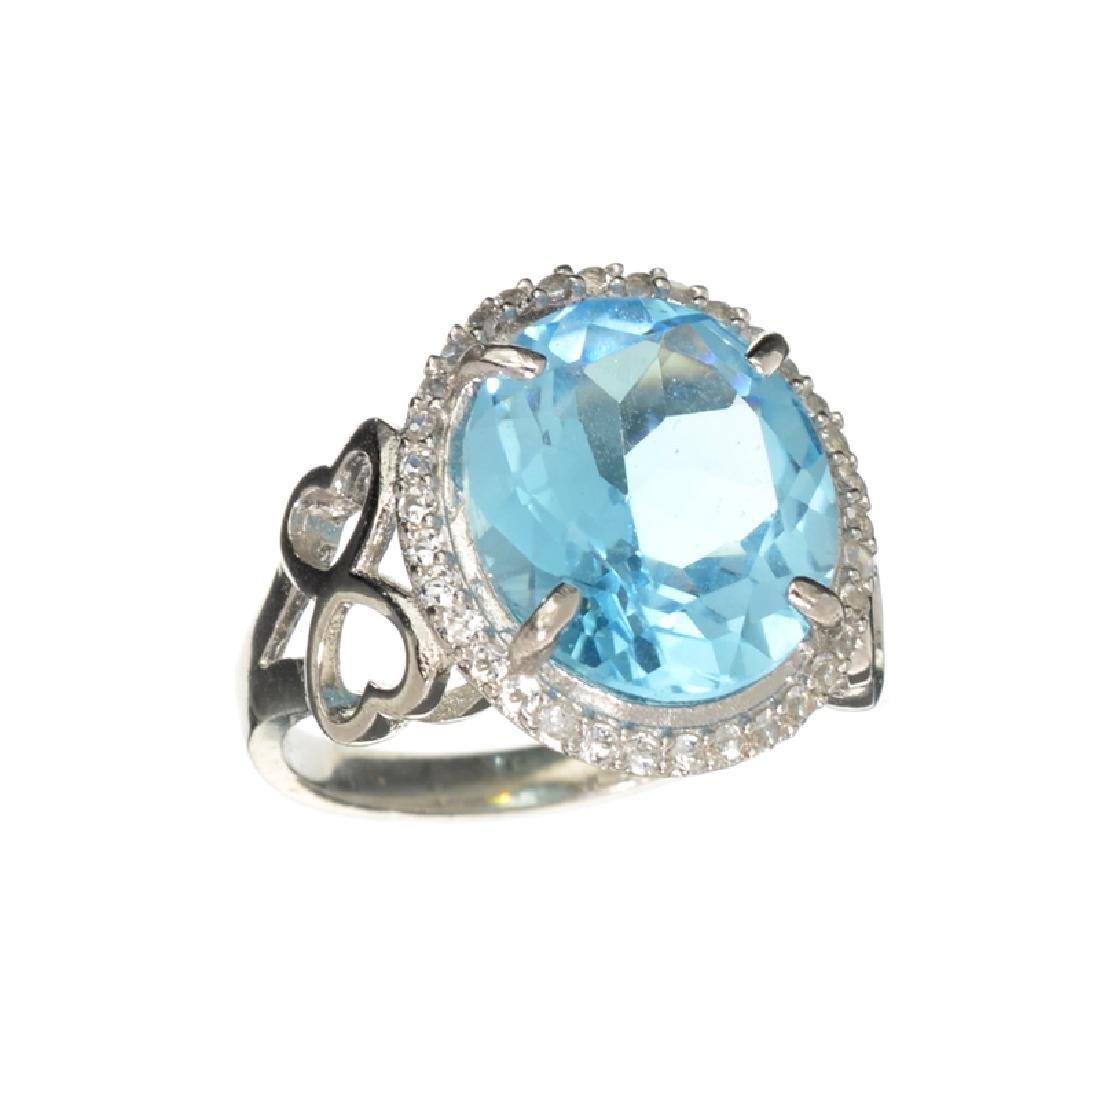 APP: 0.9k Fine Jewelry Designer Sebastian, 9.45CT Blue